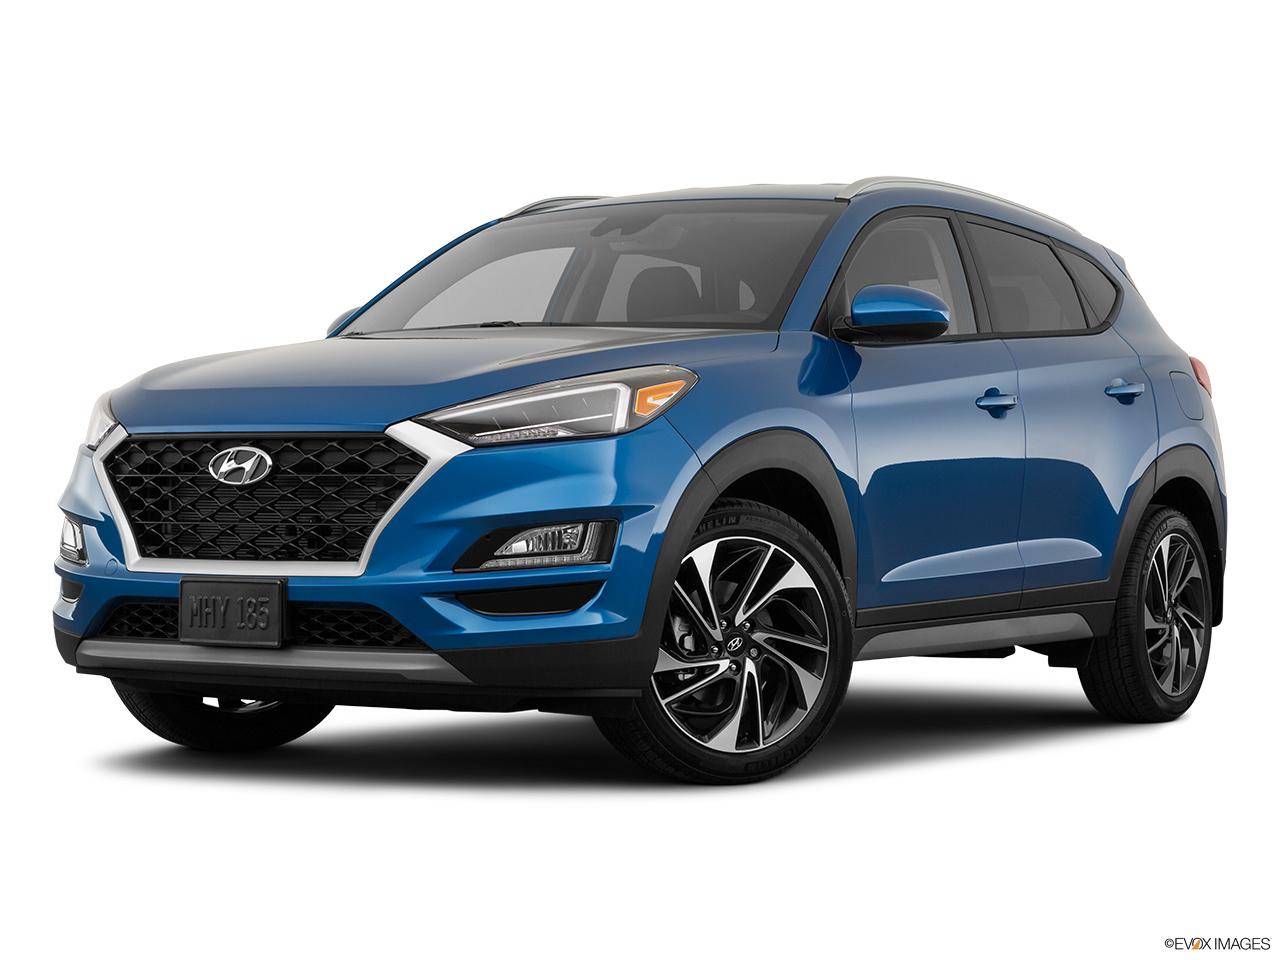 Lease a 2021 Hyundai Tucson 2.0L Automatic 2WD in Canada ...